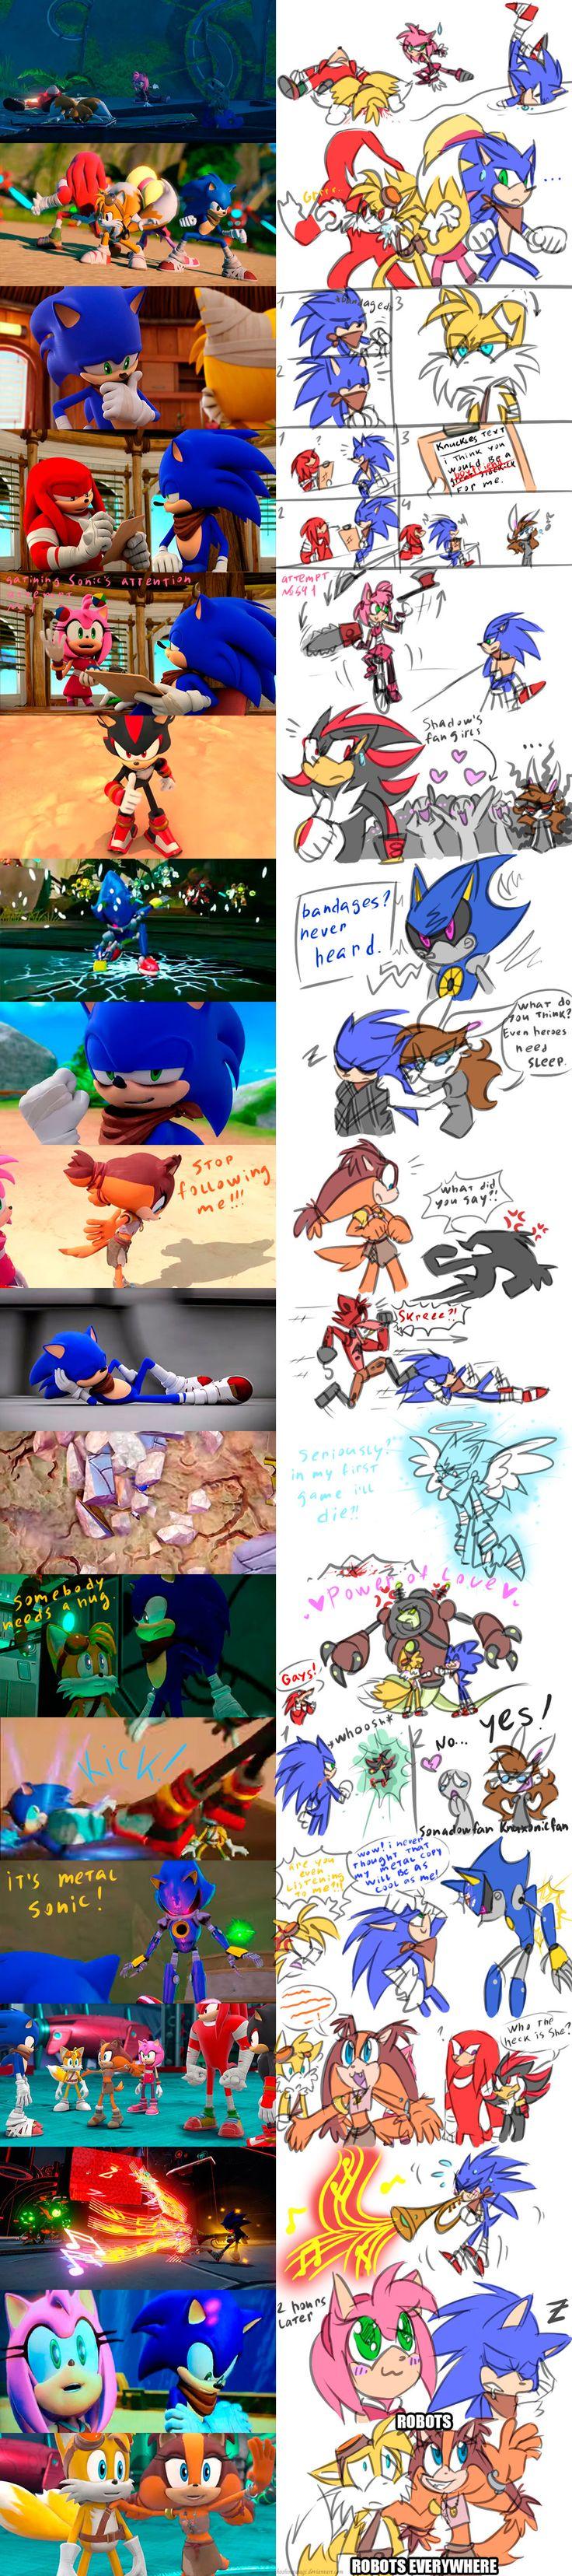 Sonic Boom: Random Screenshots redraw by HoshiNoUsagi on DeviantArt